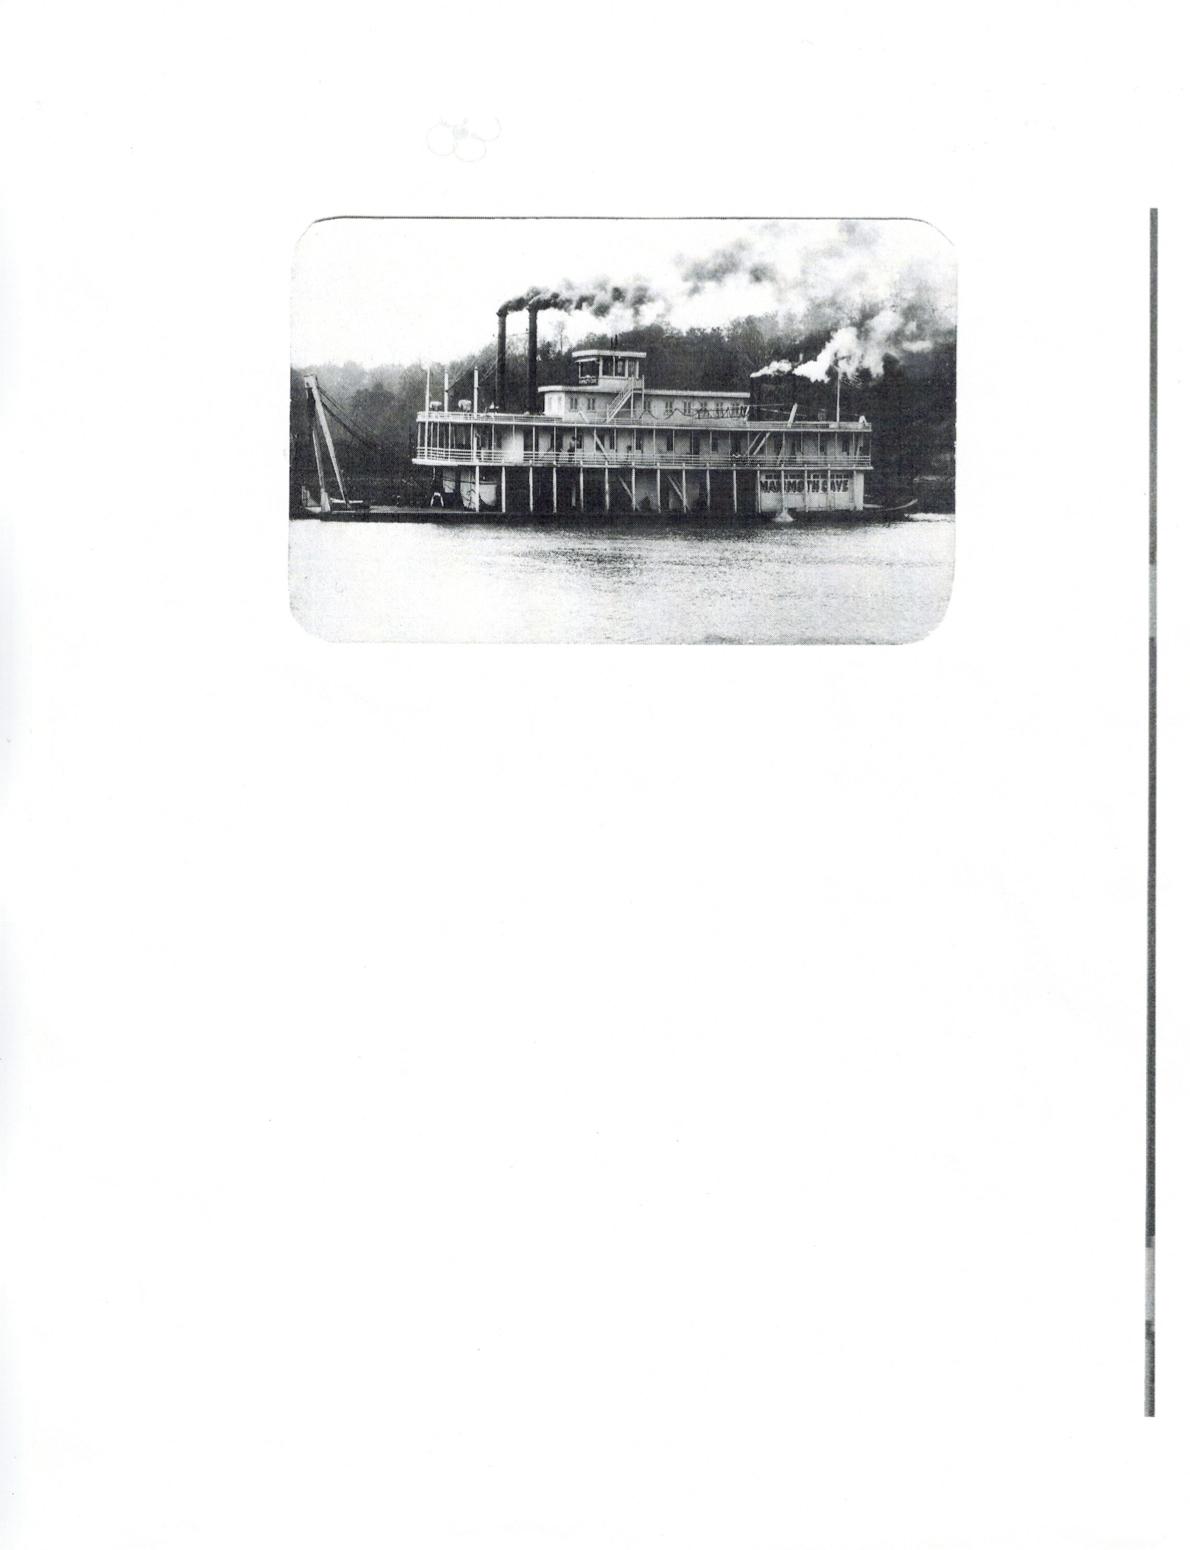 ferryCromwell.photo copy.jpg